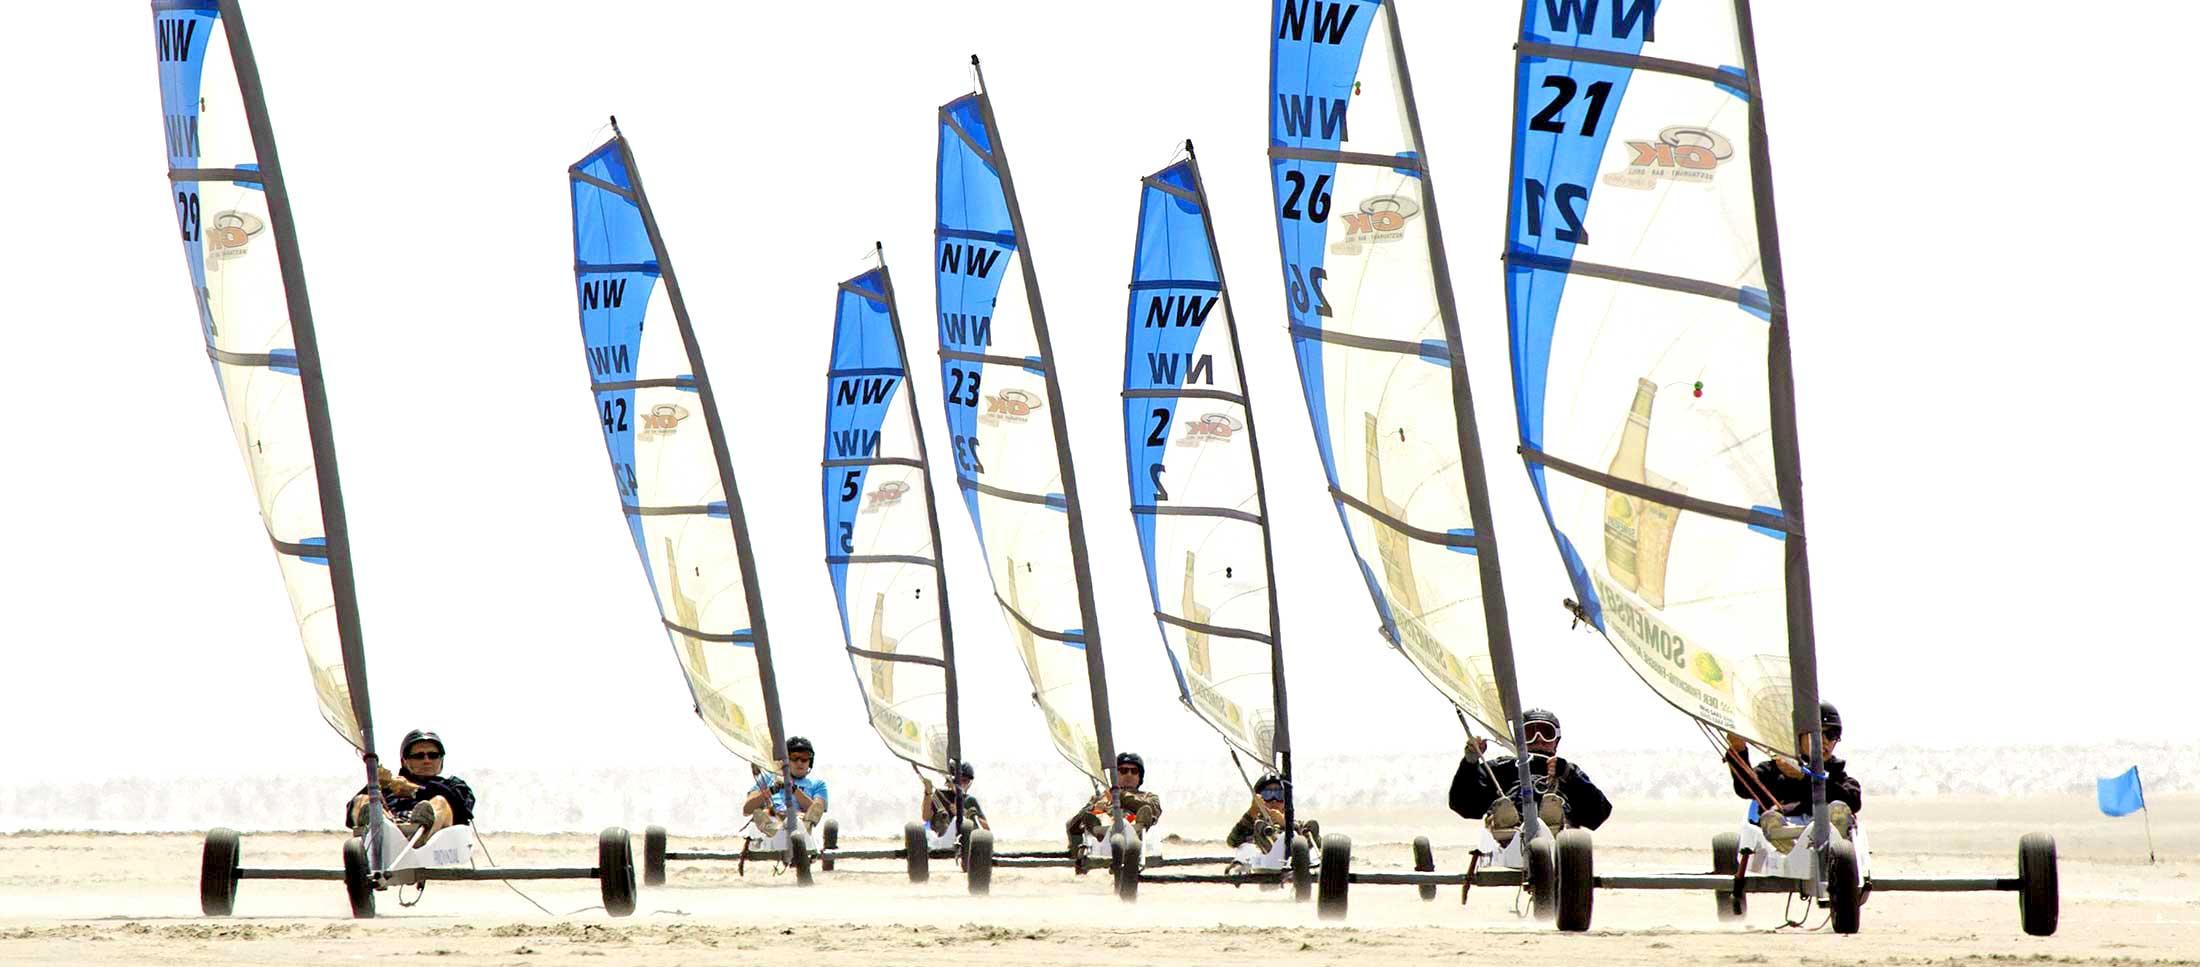 Nordsport-Event-Strandsegeln-gross